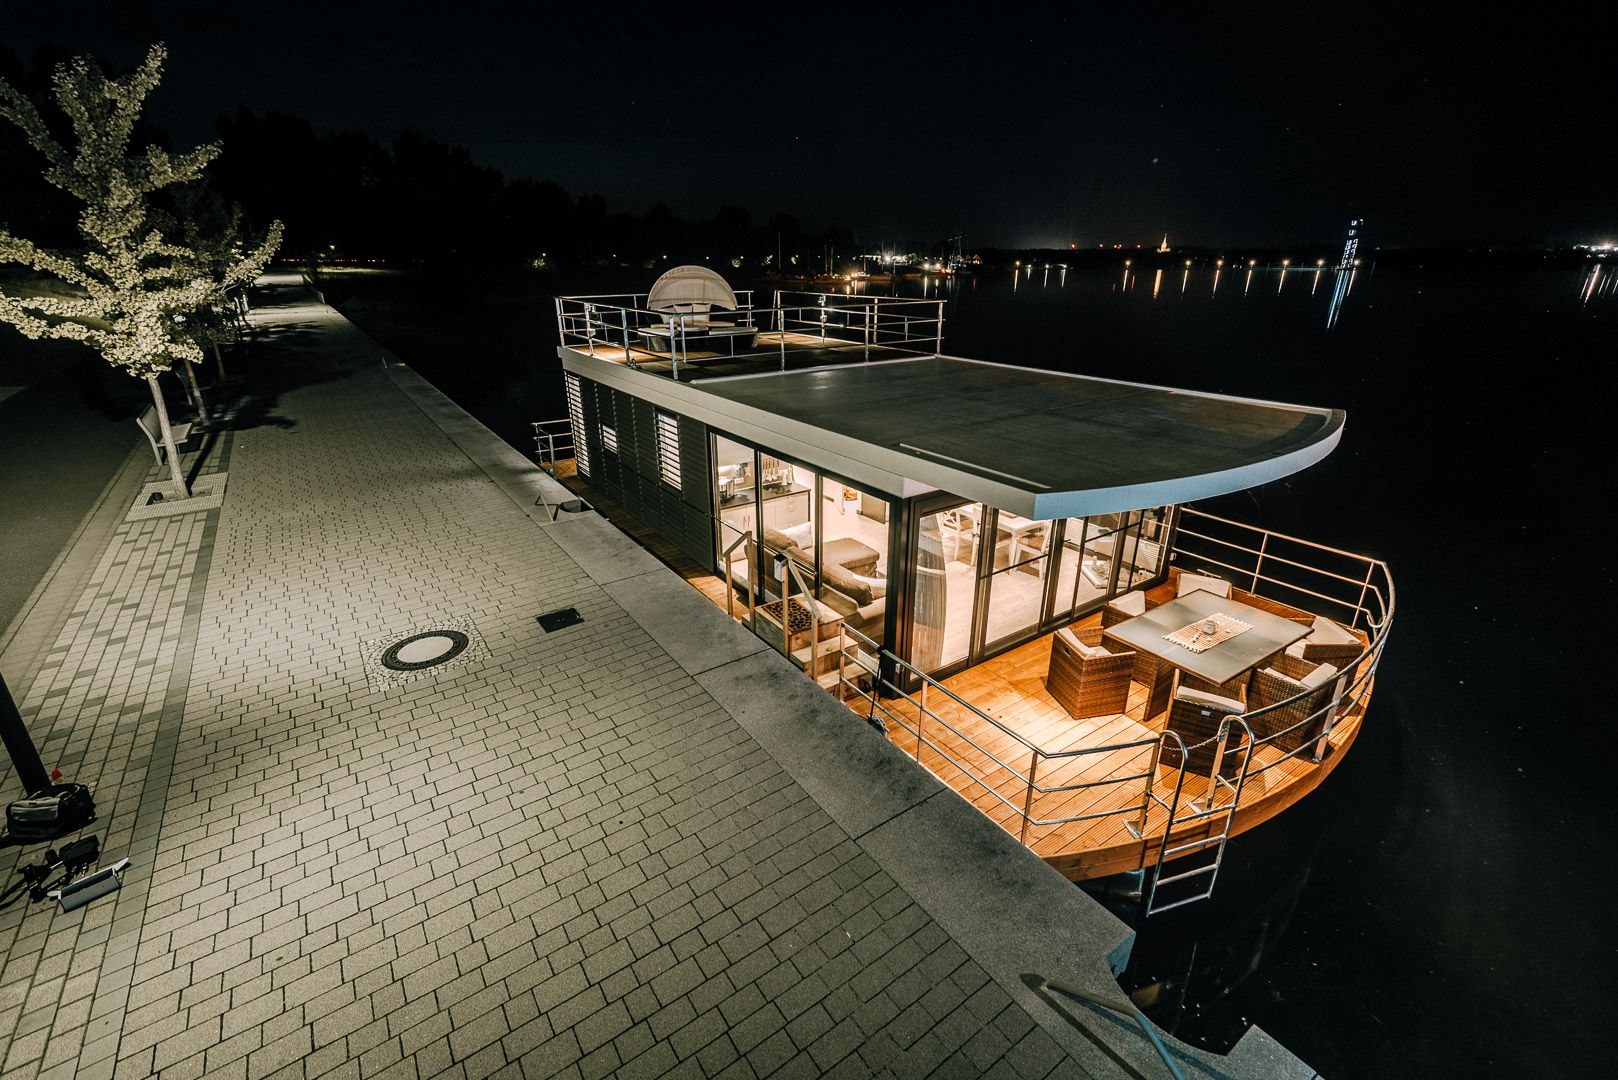 hausboothersteller aus berlin floating house gmbh hausboot kaufen oder mieten hausboot. Black Bedroom Furniture Sets. Home Design Ideas